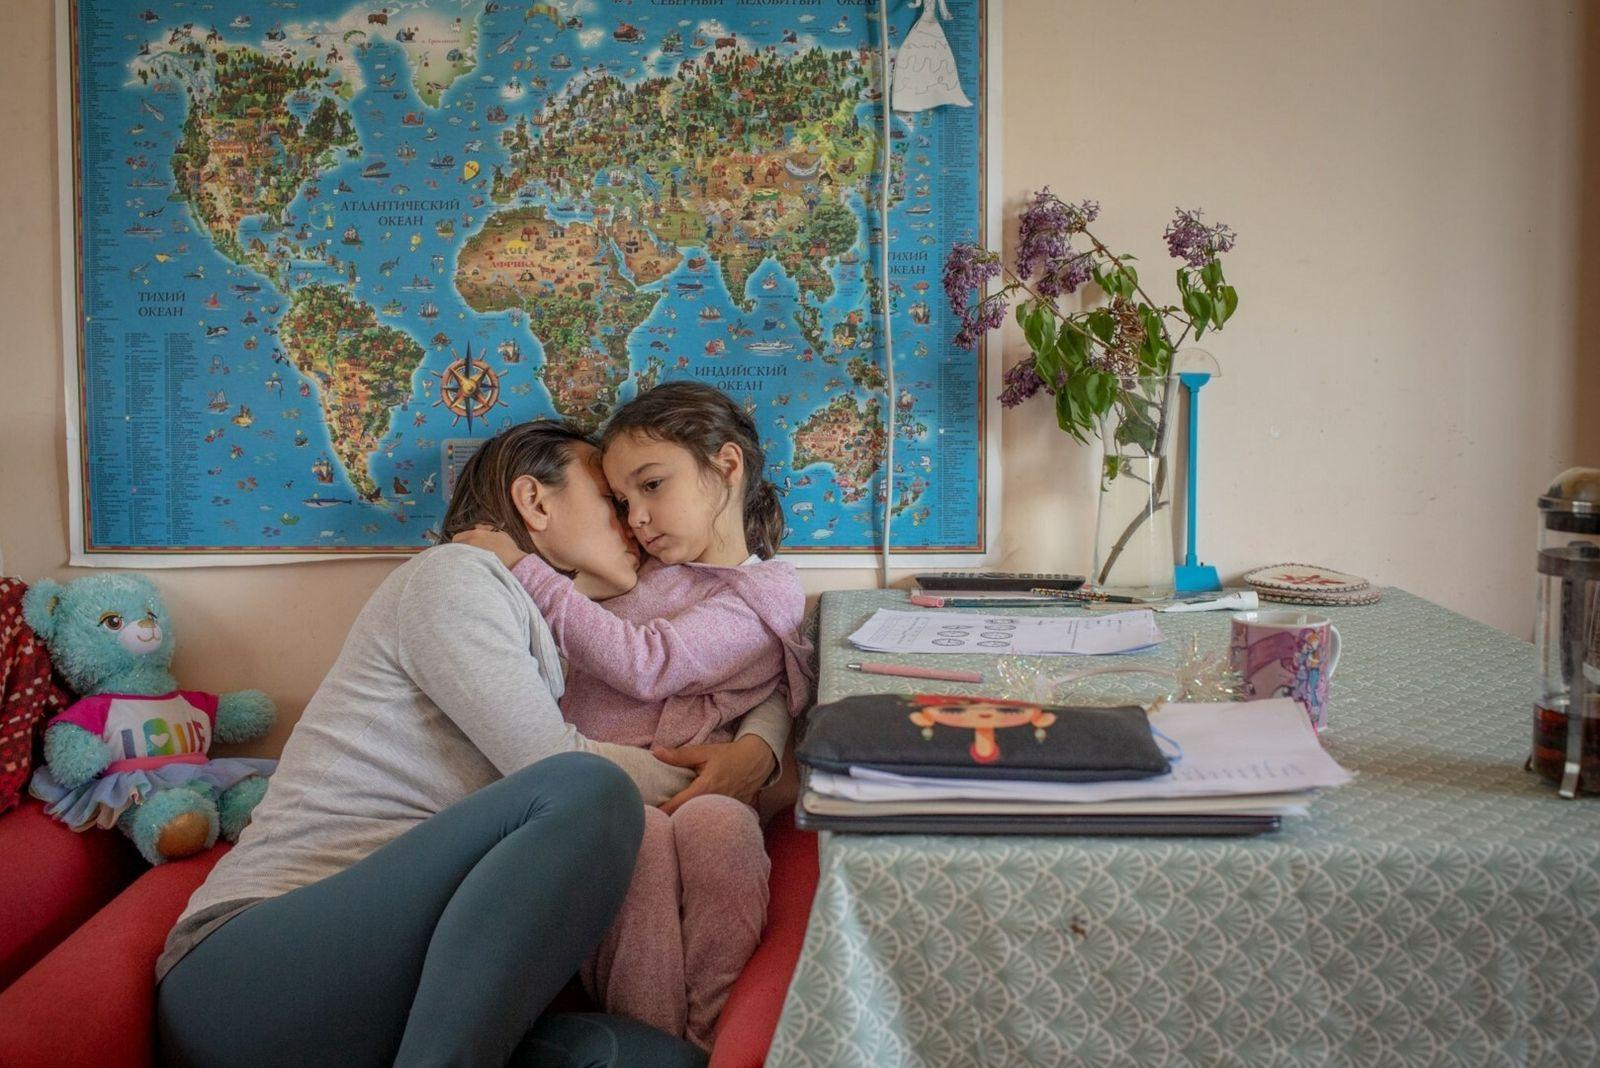 fotógrafa abraça a filha